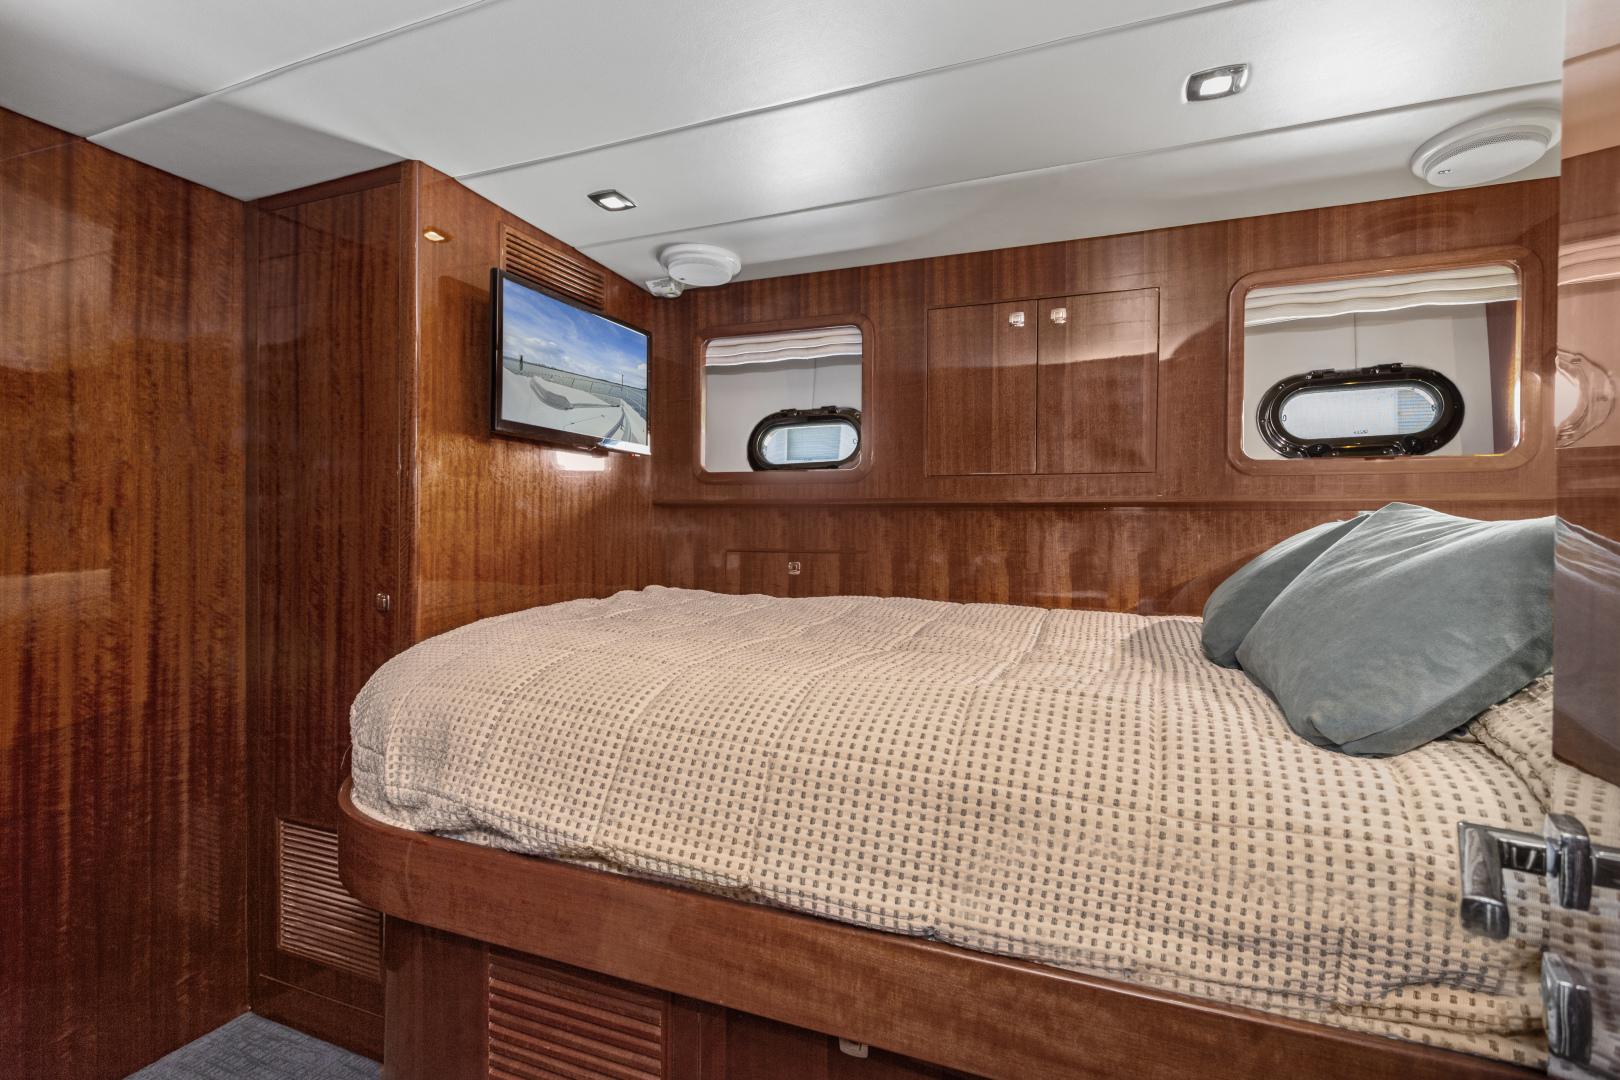 Hampton-76 Skylounge Motoryacht 2014-ODYSEA San Diego-California-United States-GUEST STATEROOM-1165171 | Thumbnail